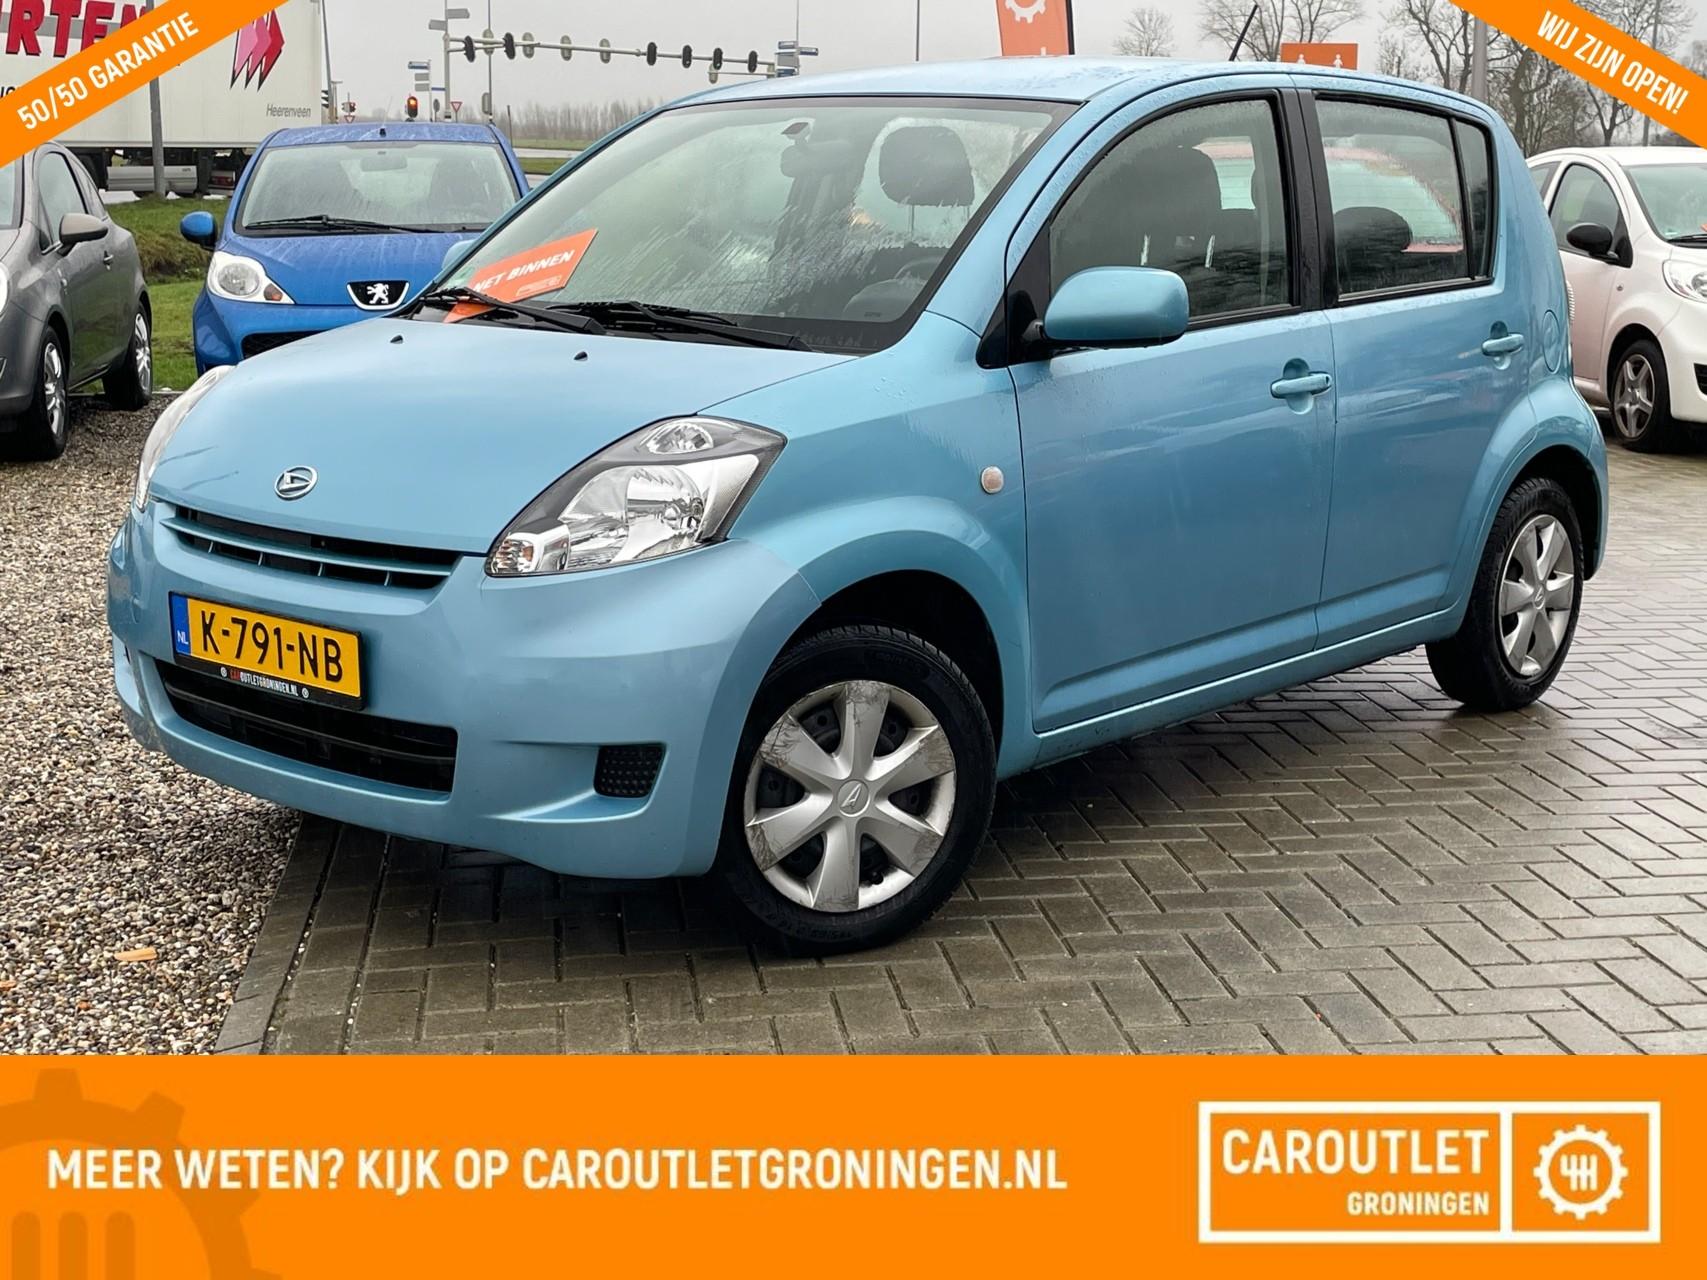 Caroutlet Groningen - Daihatsu Sirion 2 1.0-12V Premium | NET BINNEN! | AIRCO | 2010